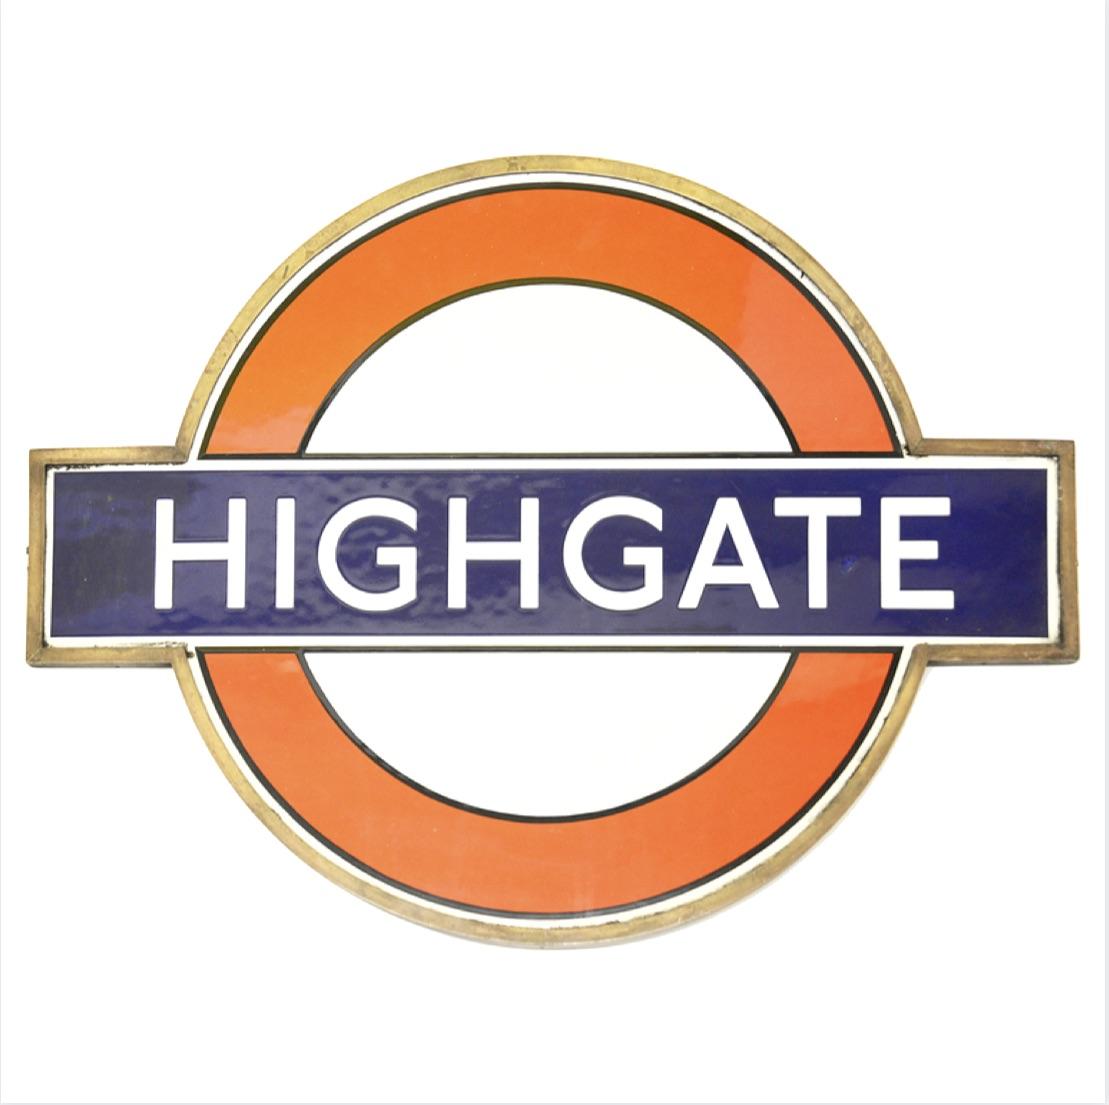 London Undergound 'Highgate' station sign